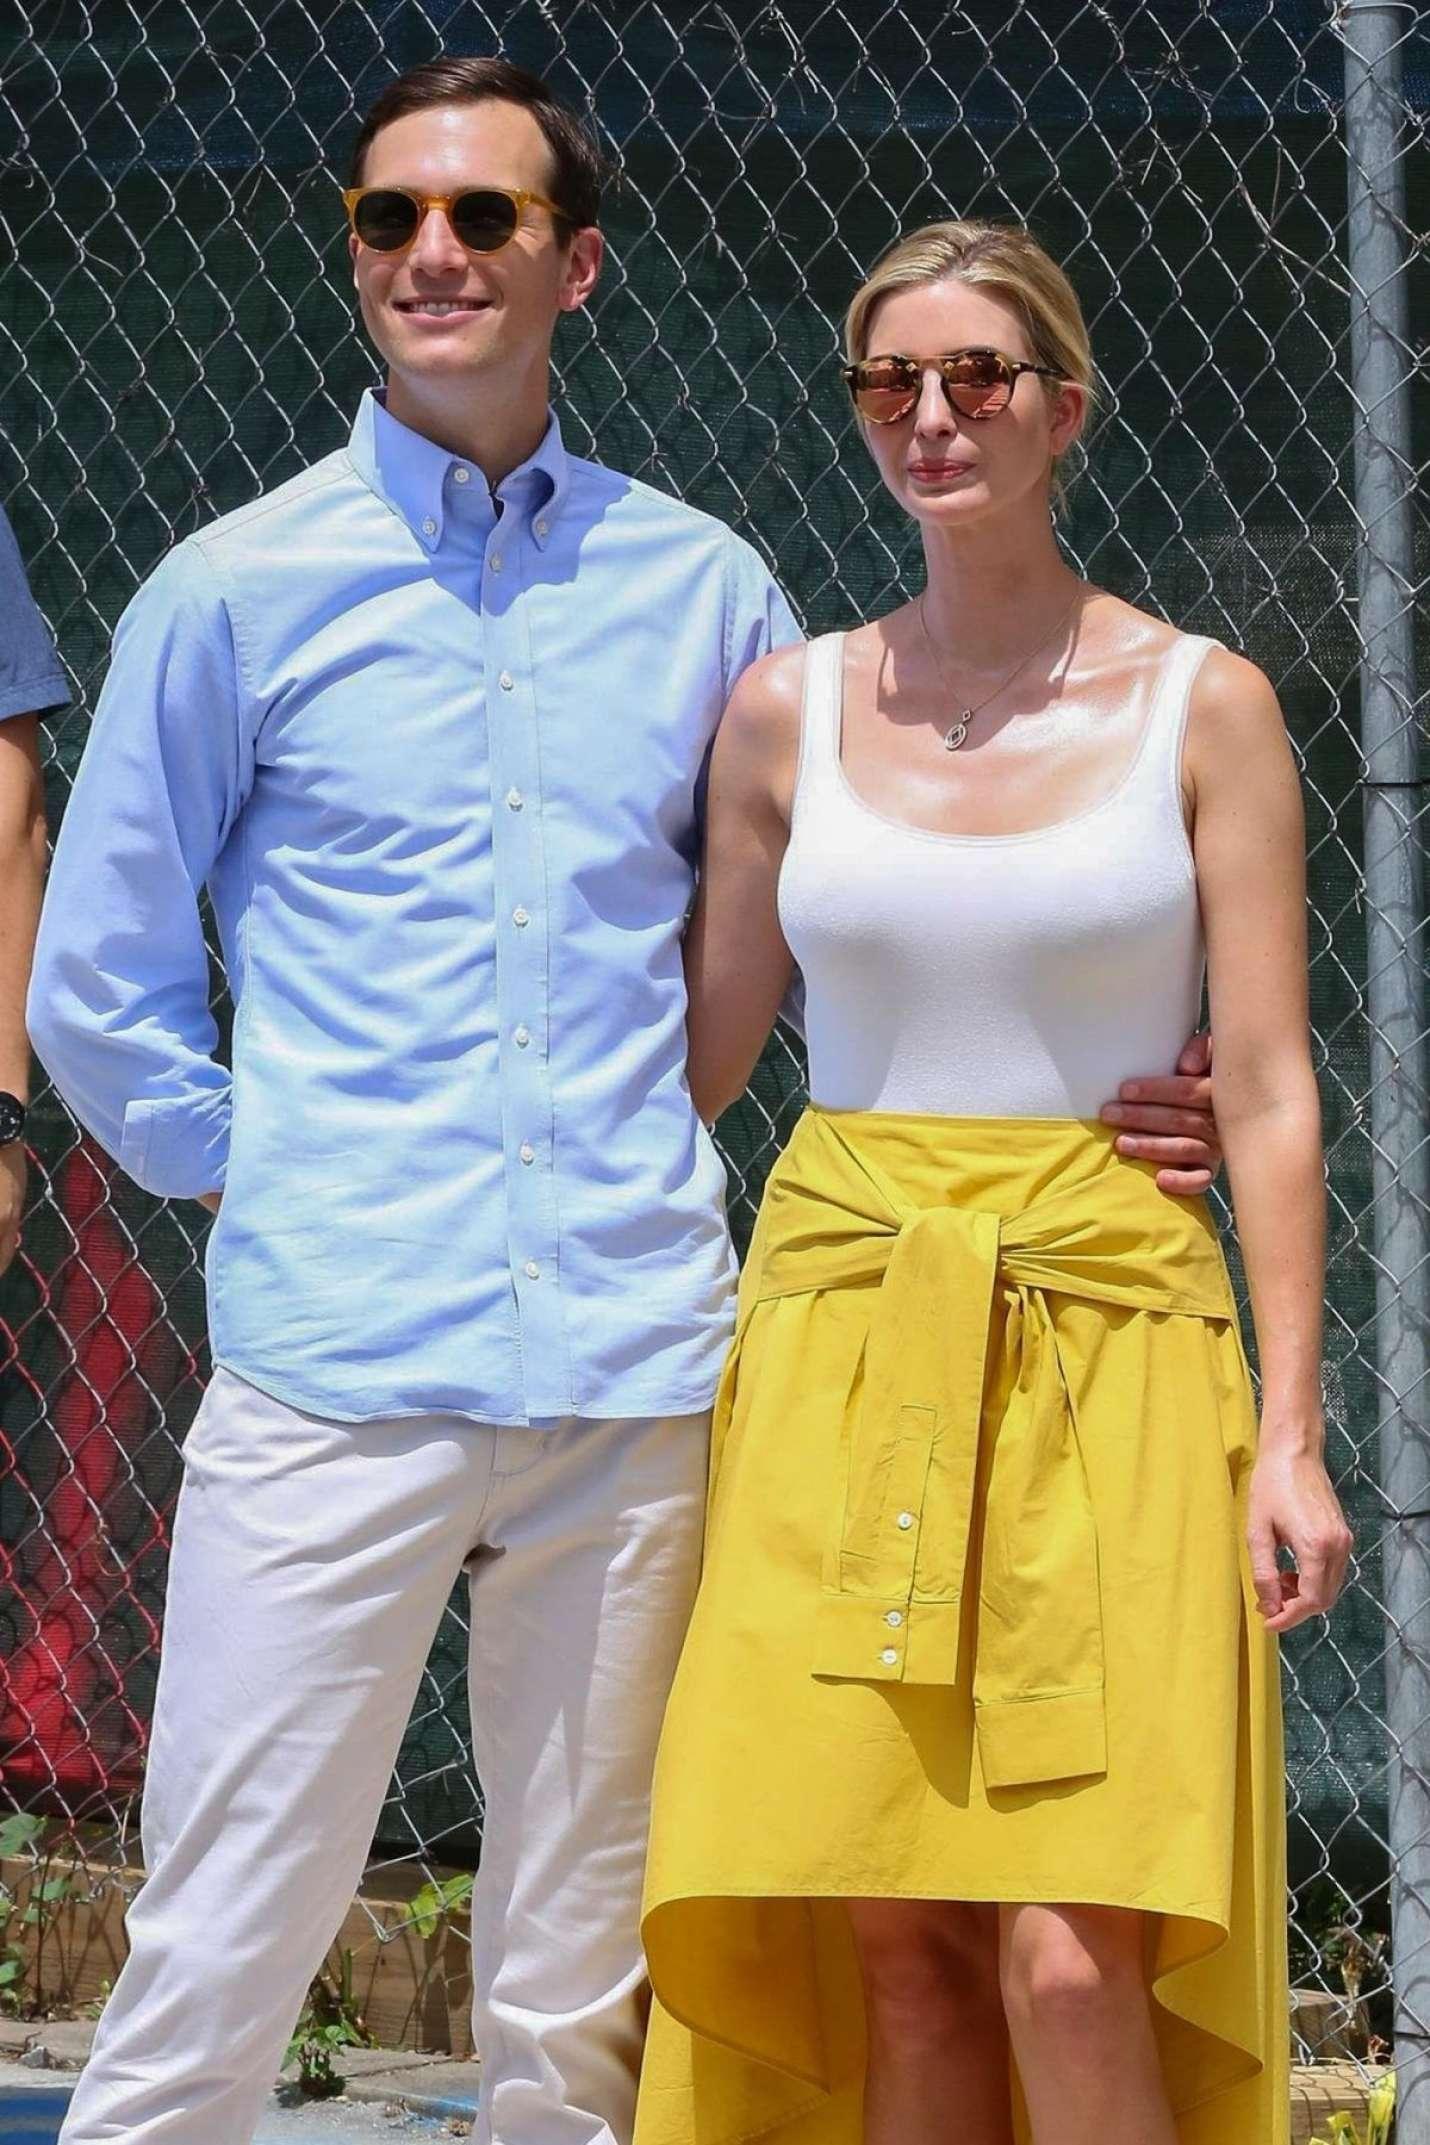 Ivanka Trump And Jared Kushner Out in Washington